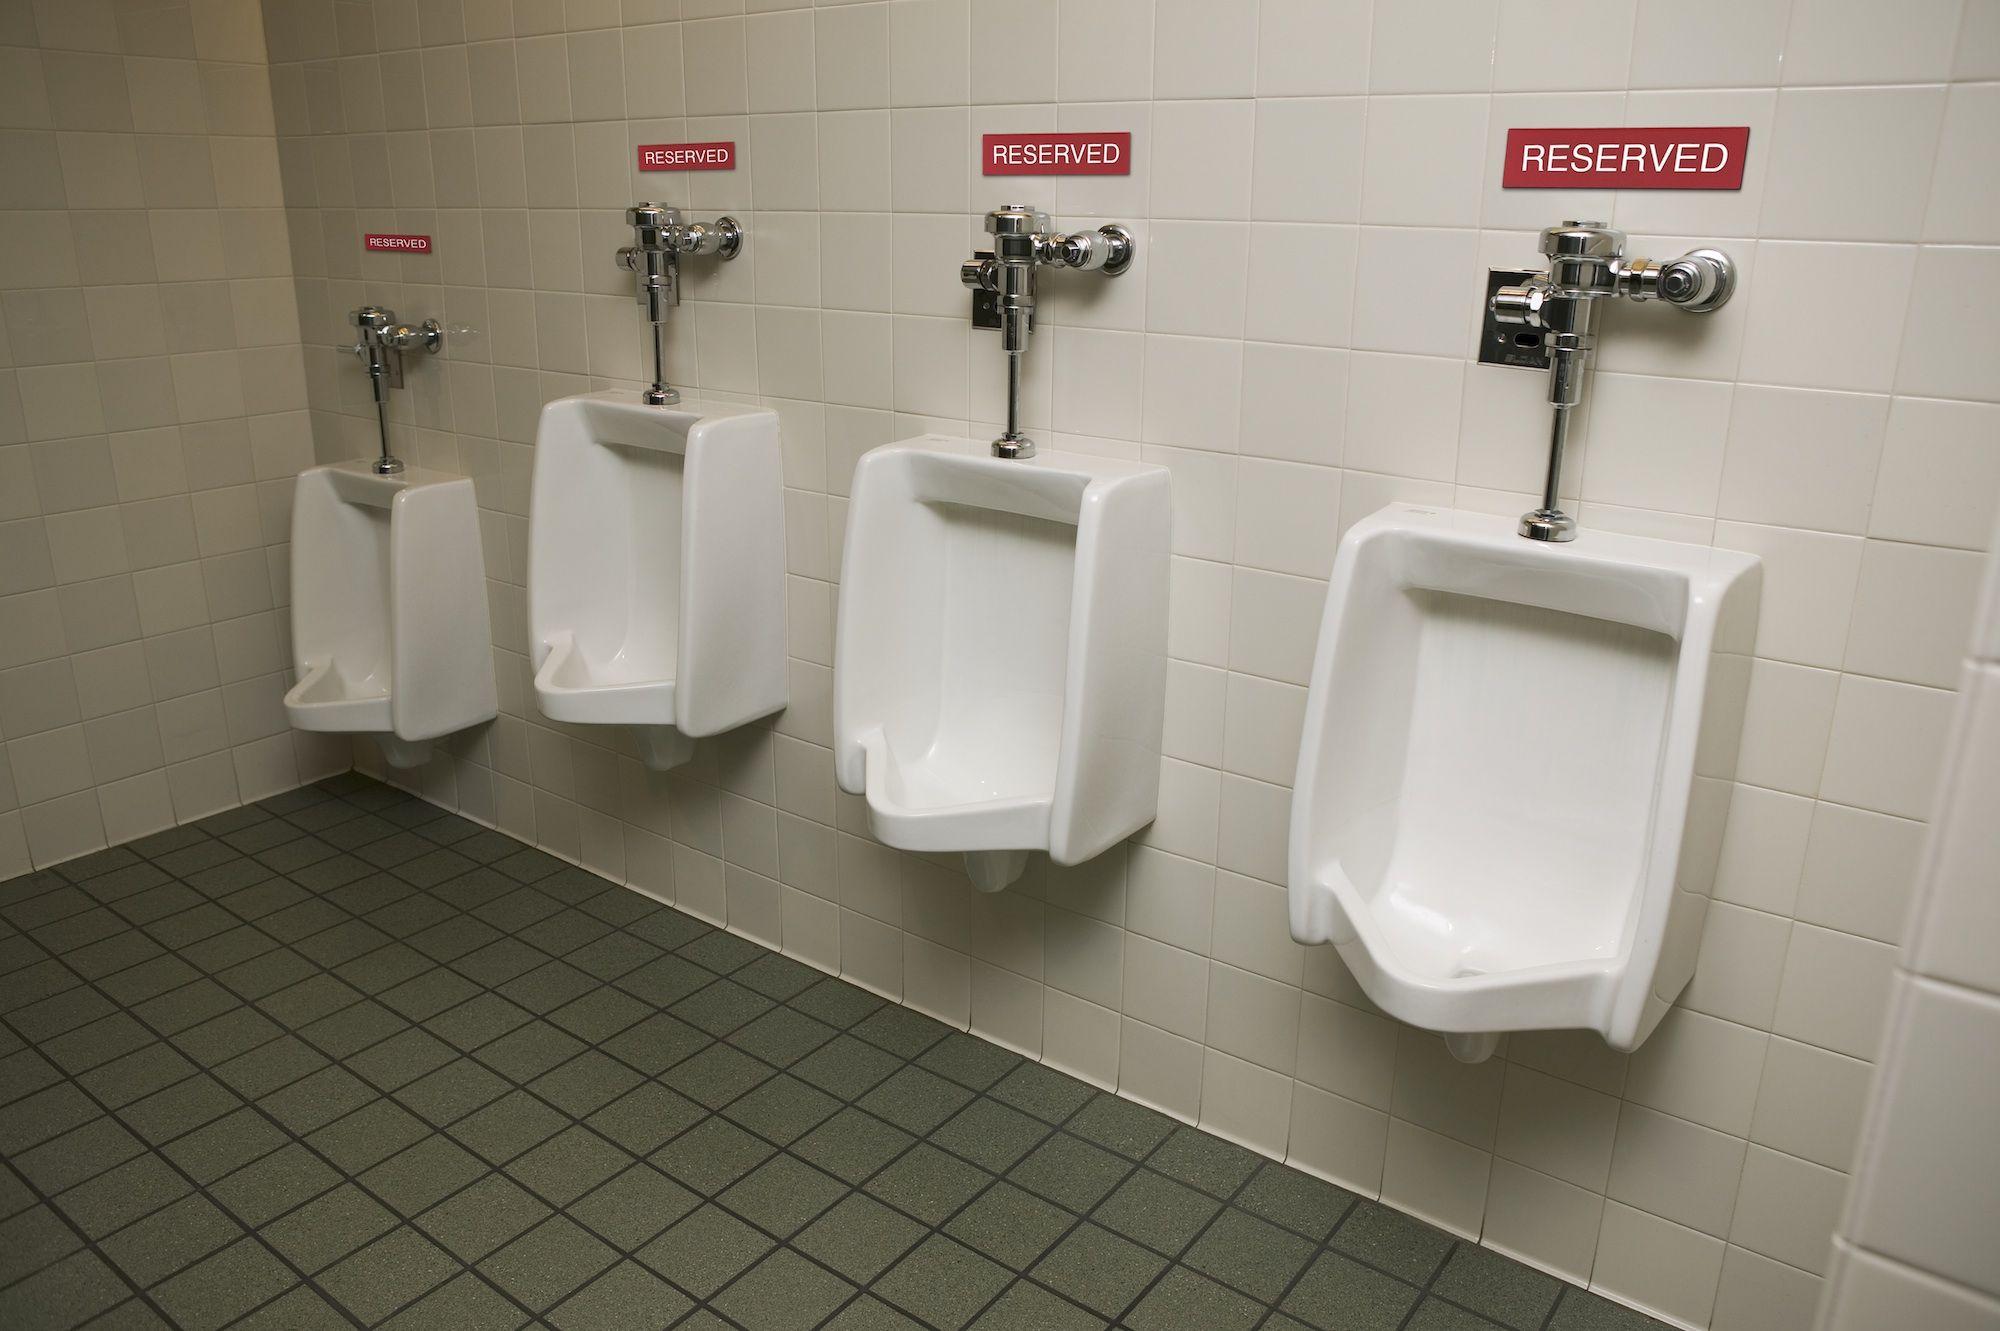 Charmant Should Men Talk At The Urinal?